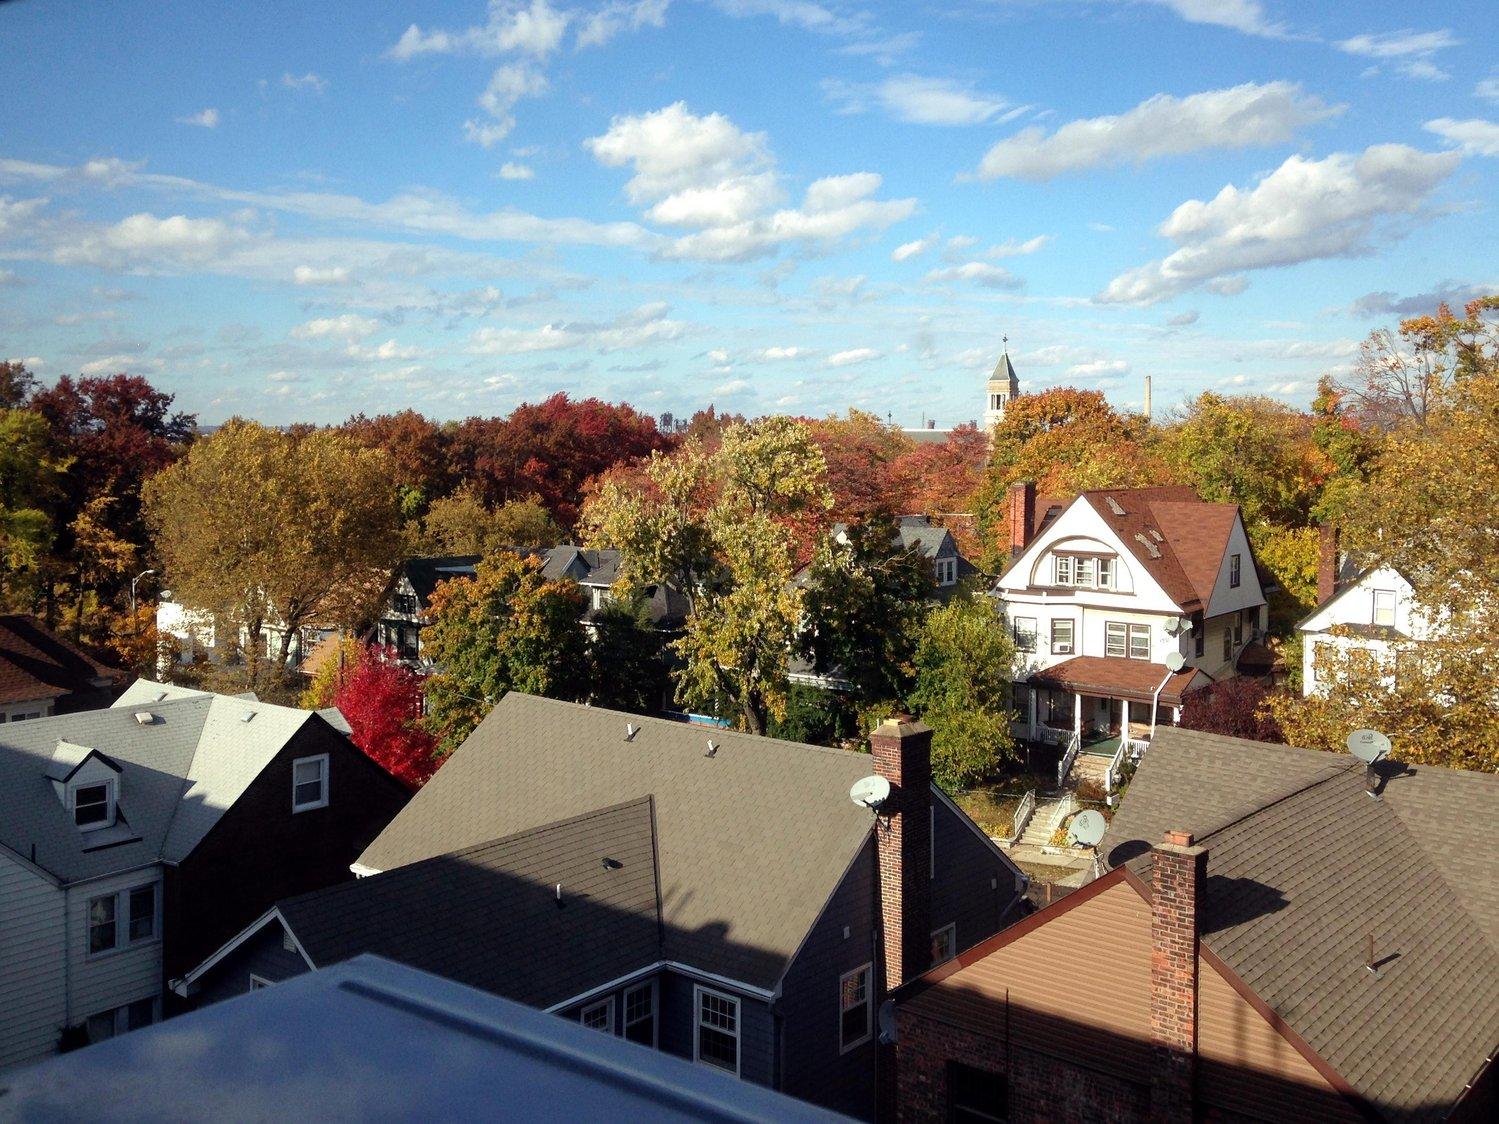 New Homes in Blakeslee PA